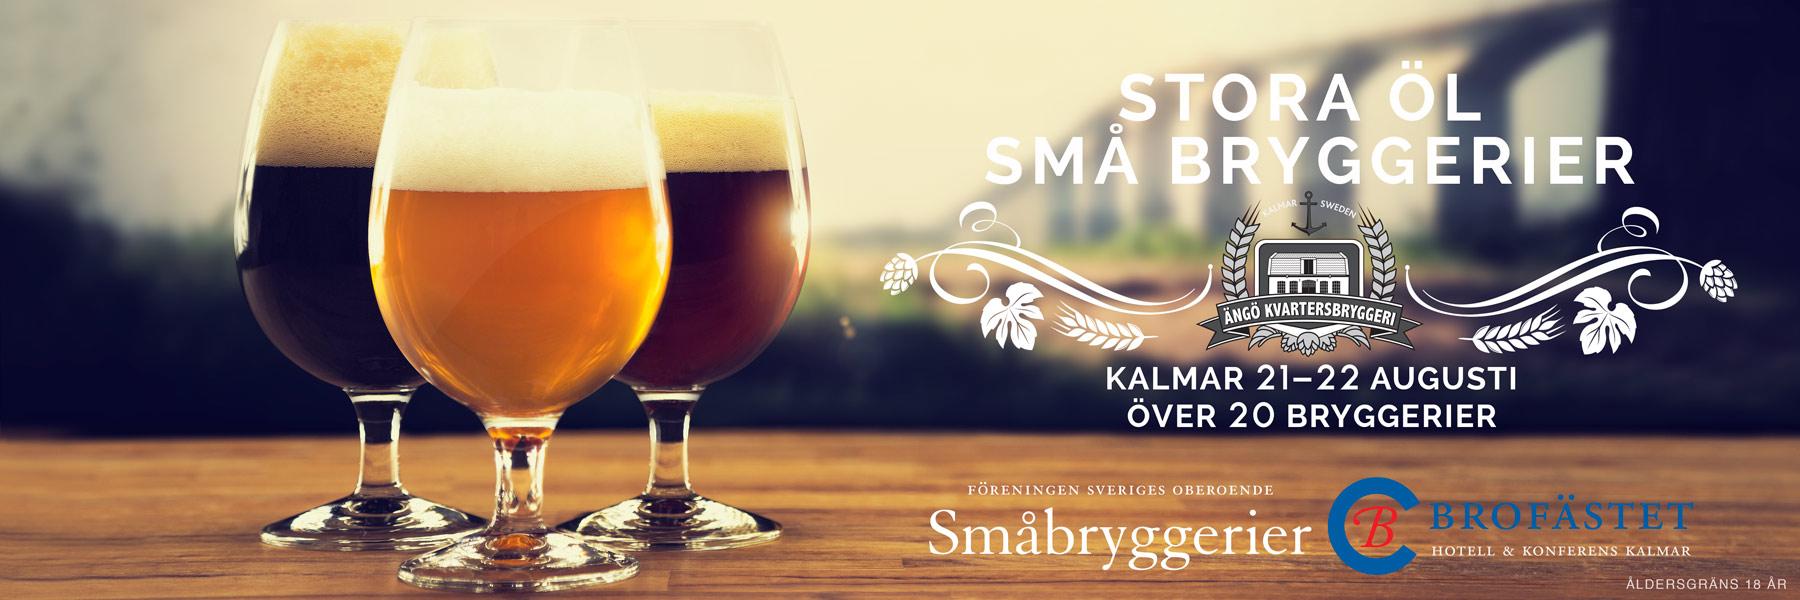 Stora öl - Små bryggerier